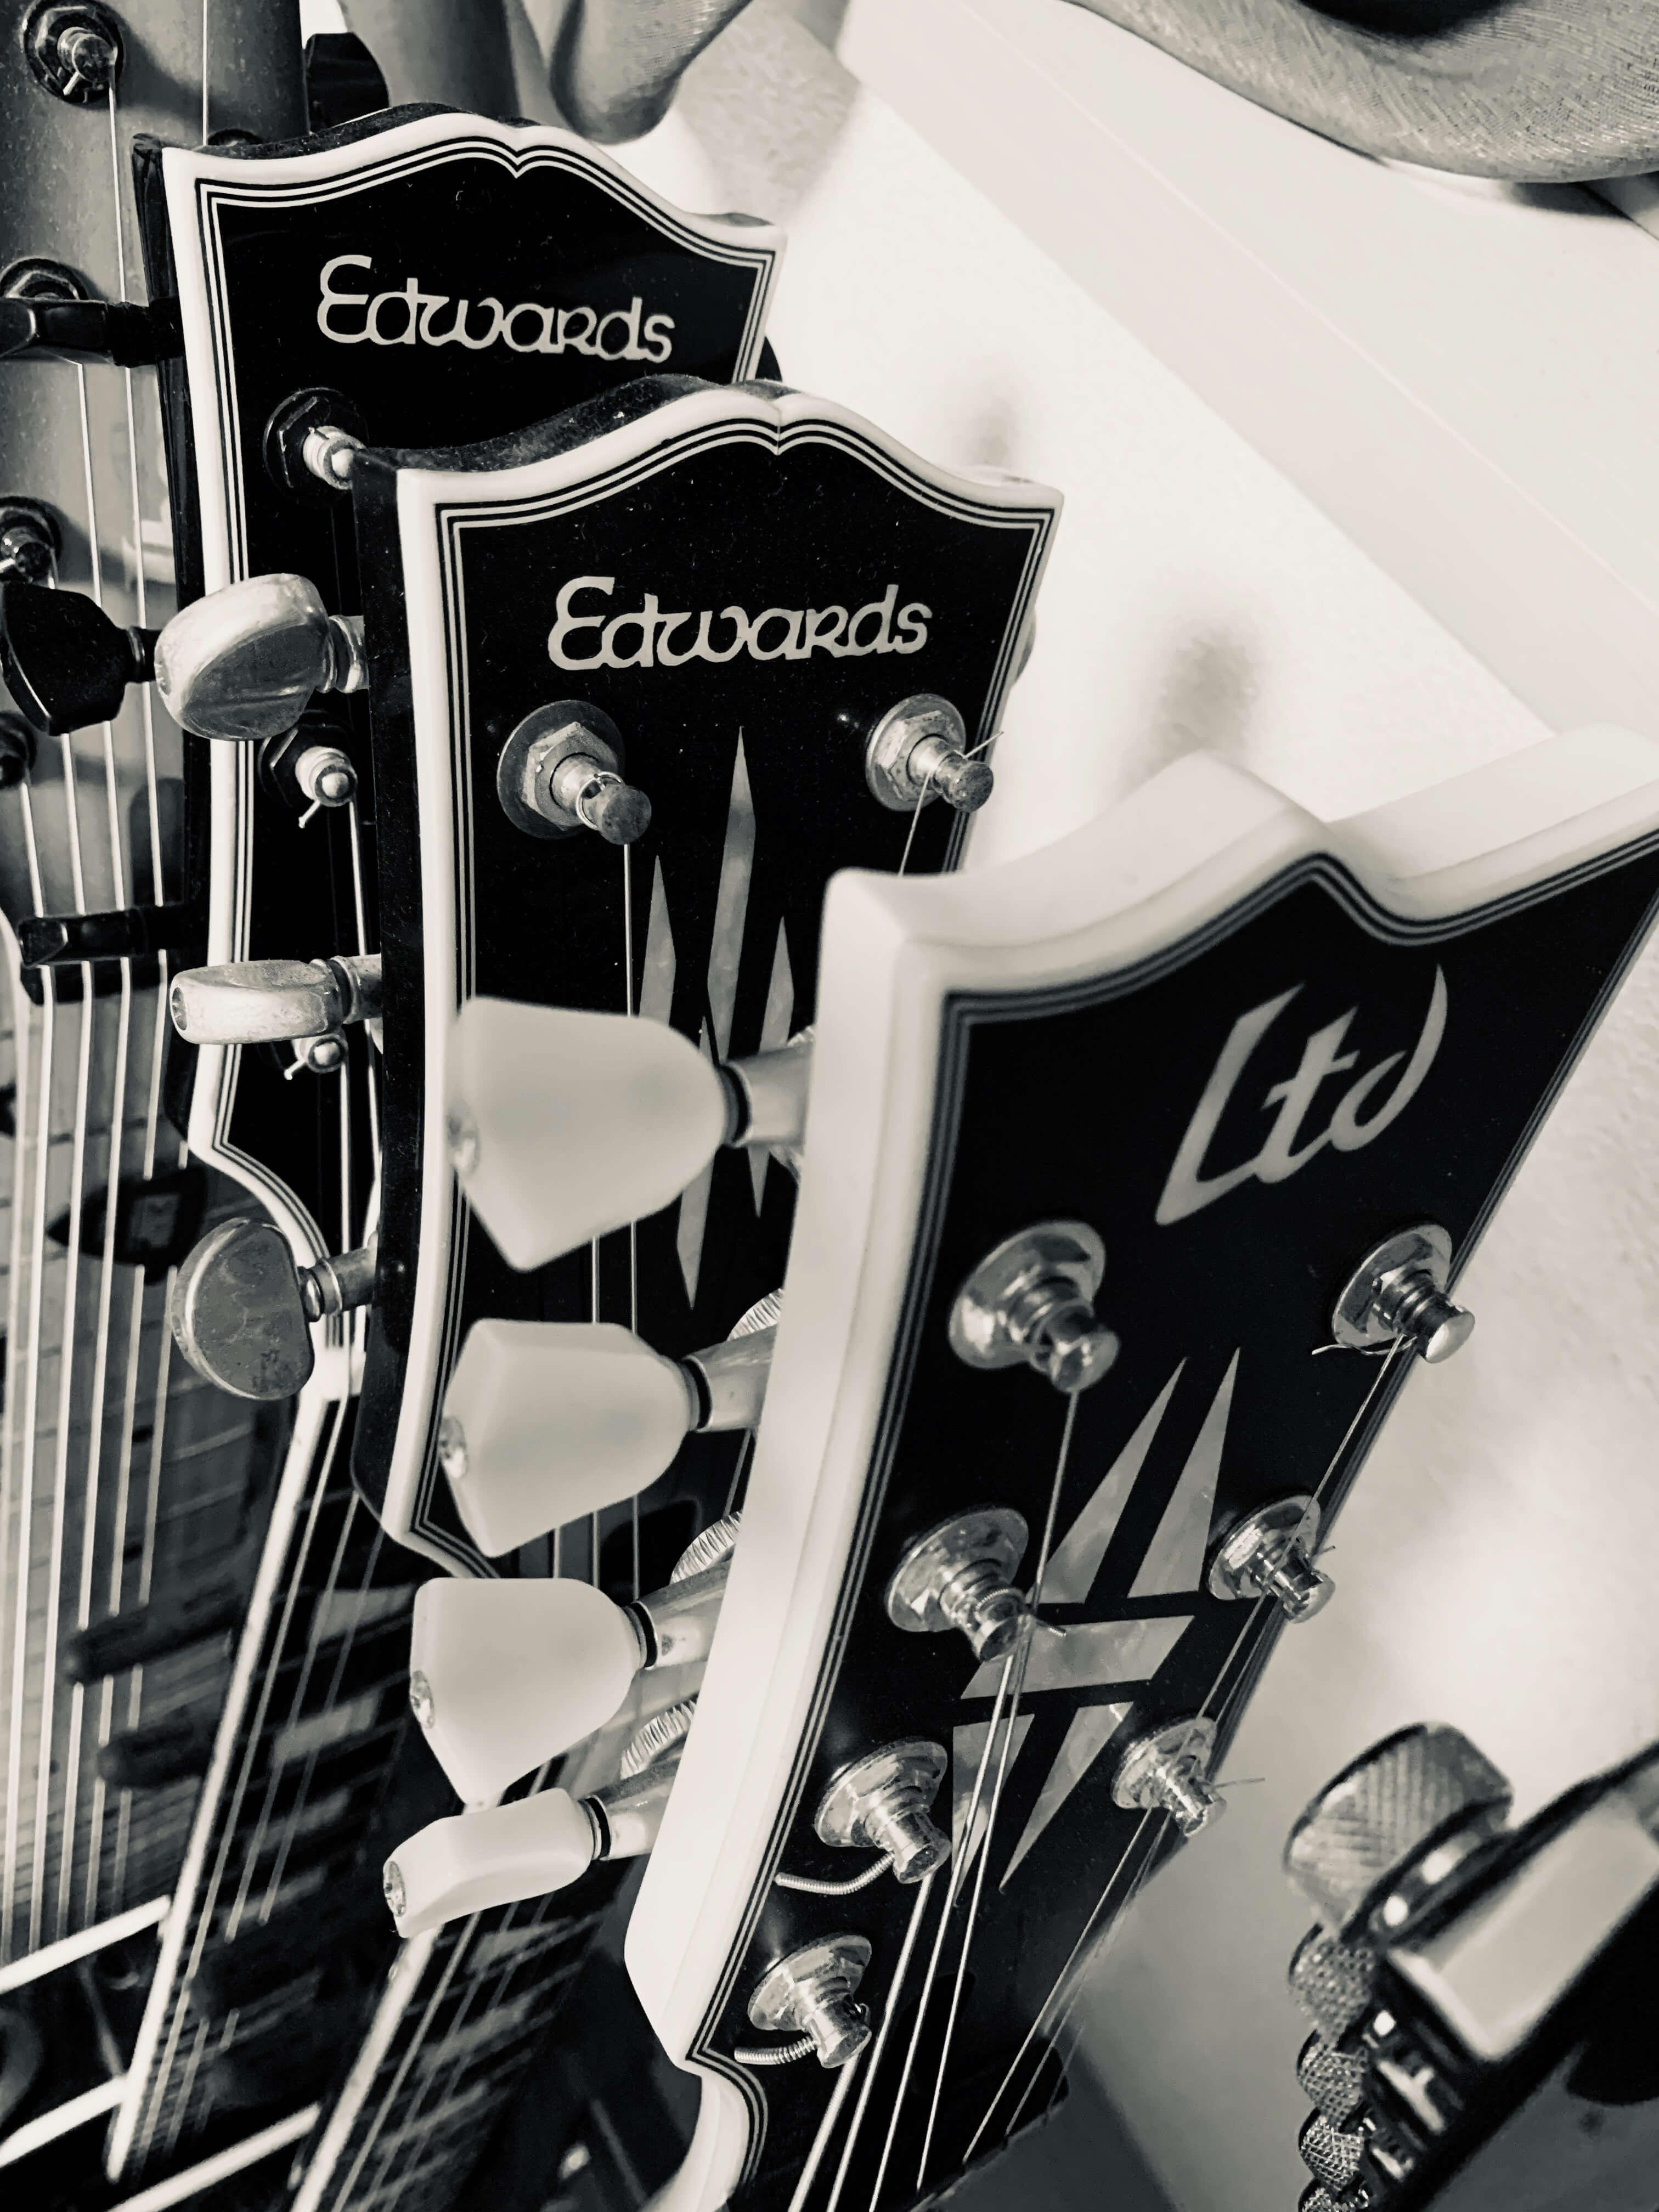 My ESP gears.